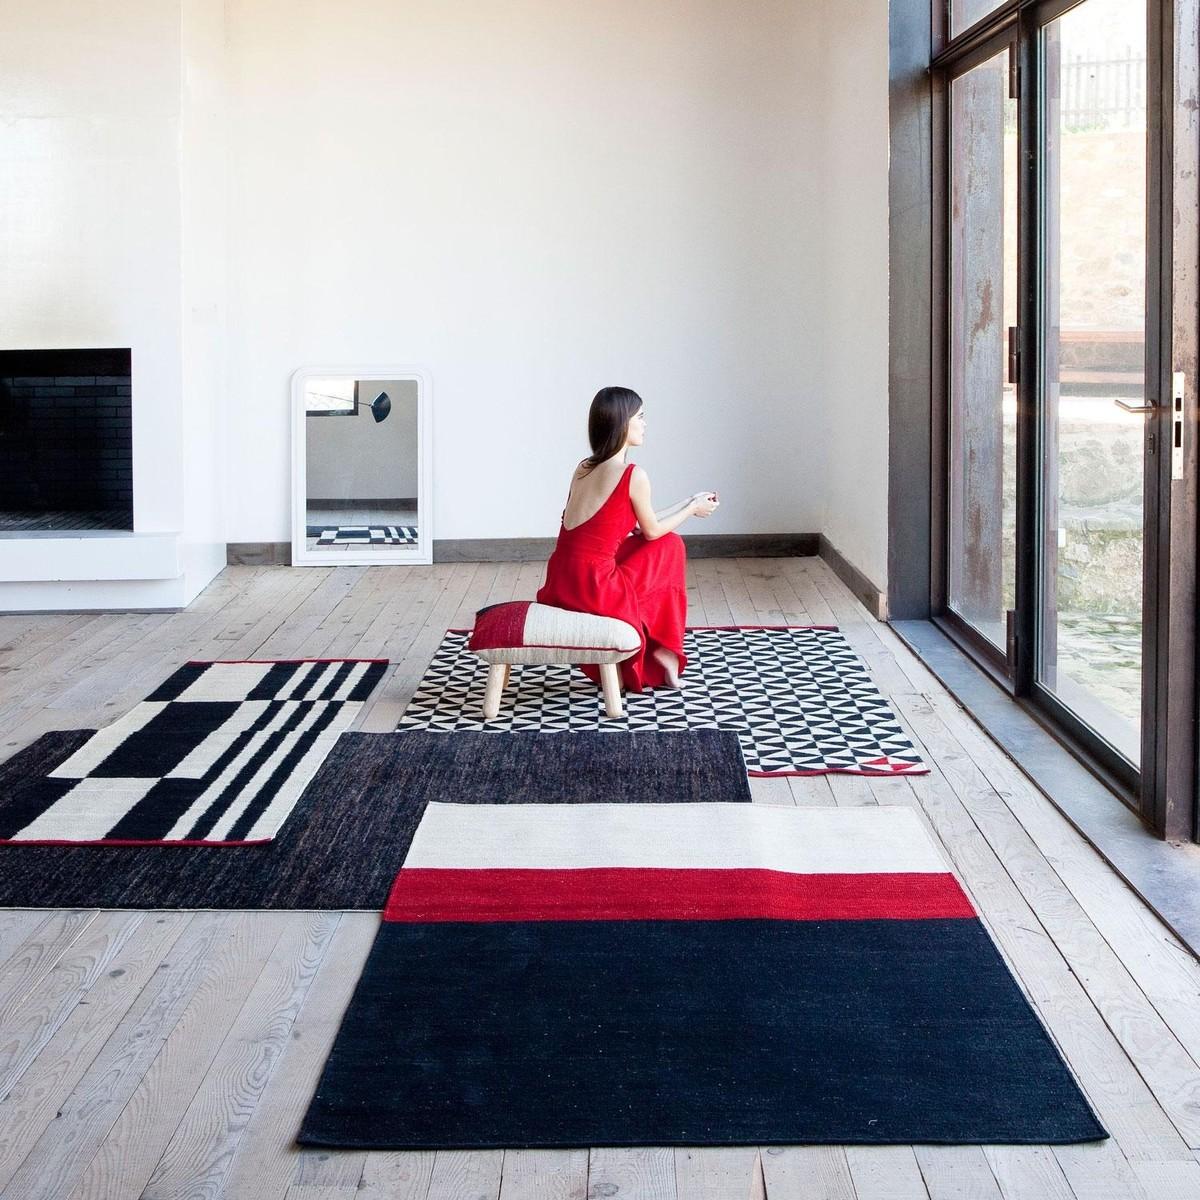 m lange stripes 1 kilim tapis de couloir nanimarquina k lims tapis textiles. Black Bedroom Furniture Sets. Home Design Ideas